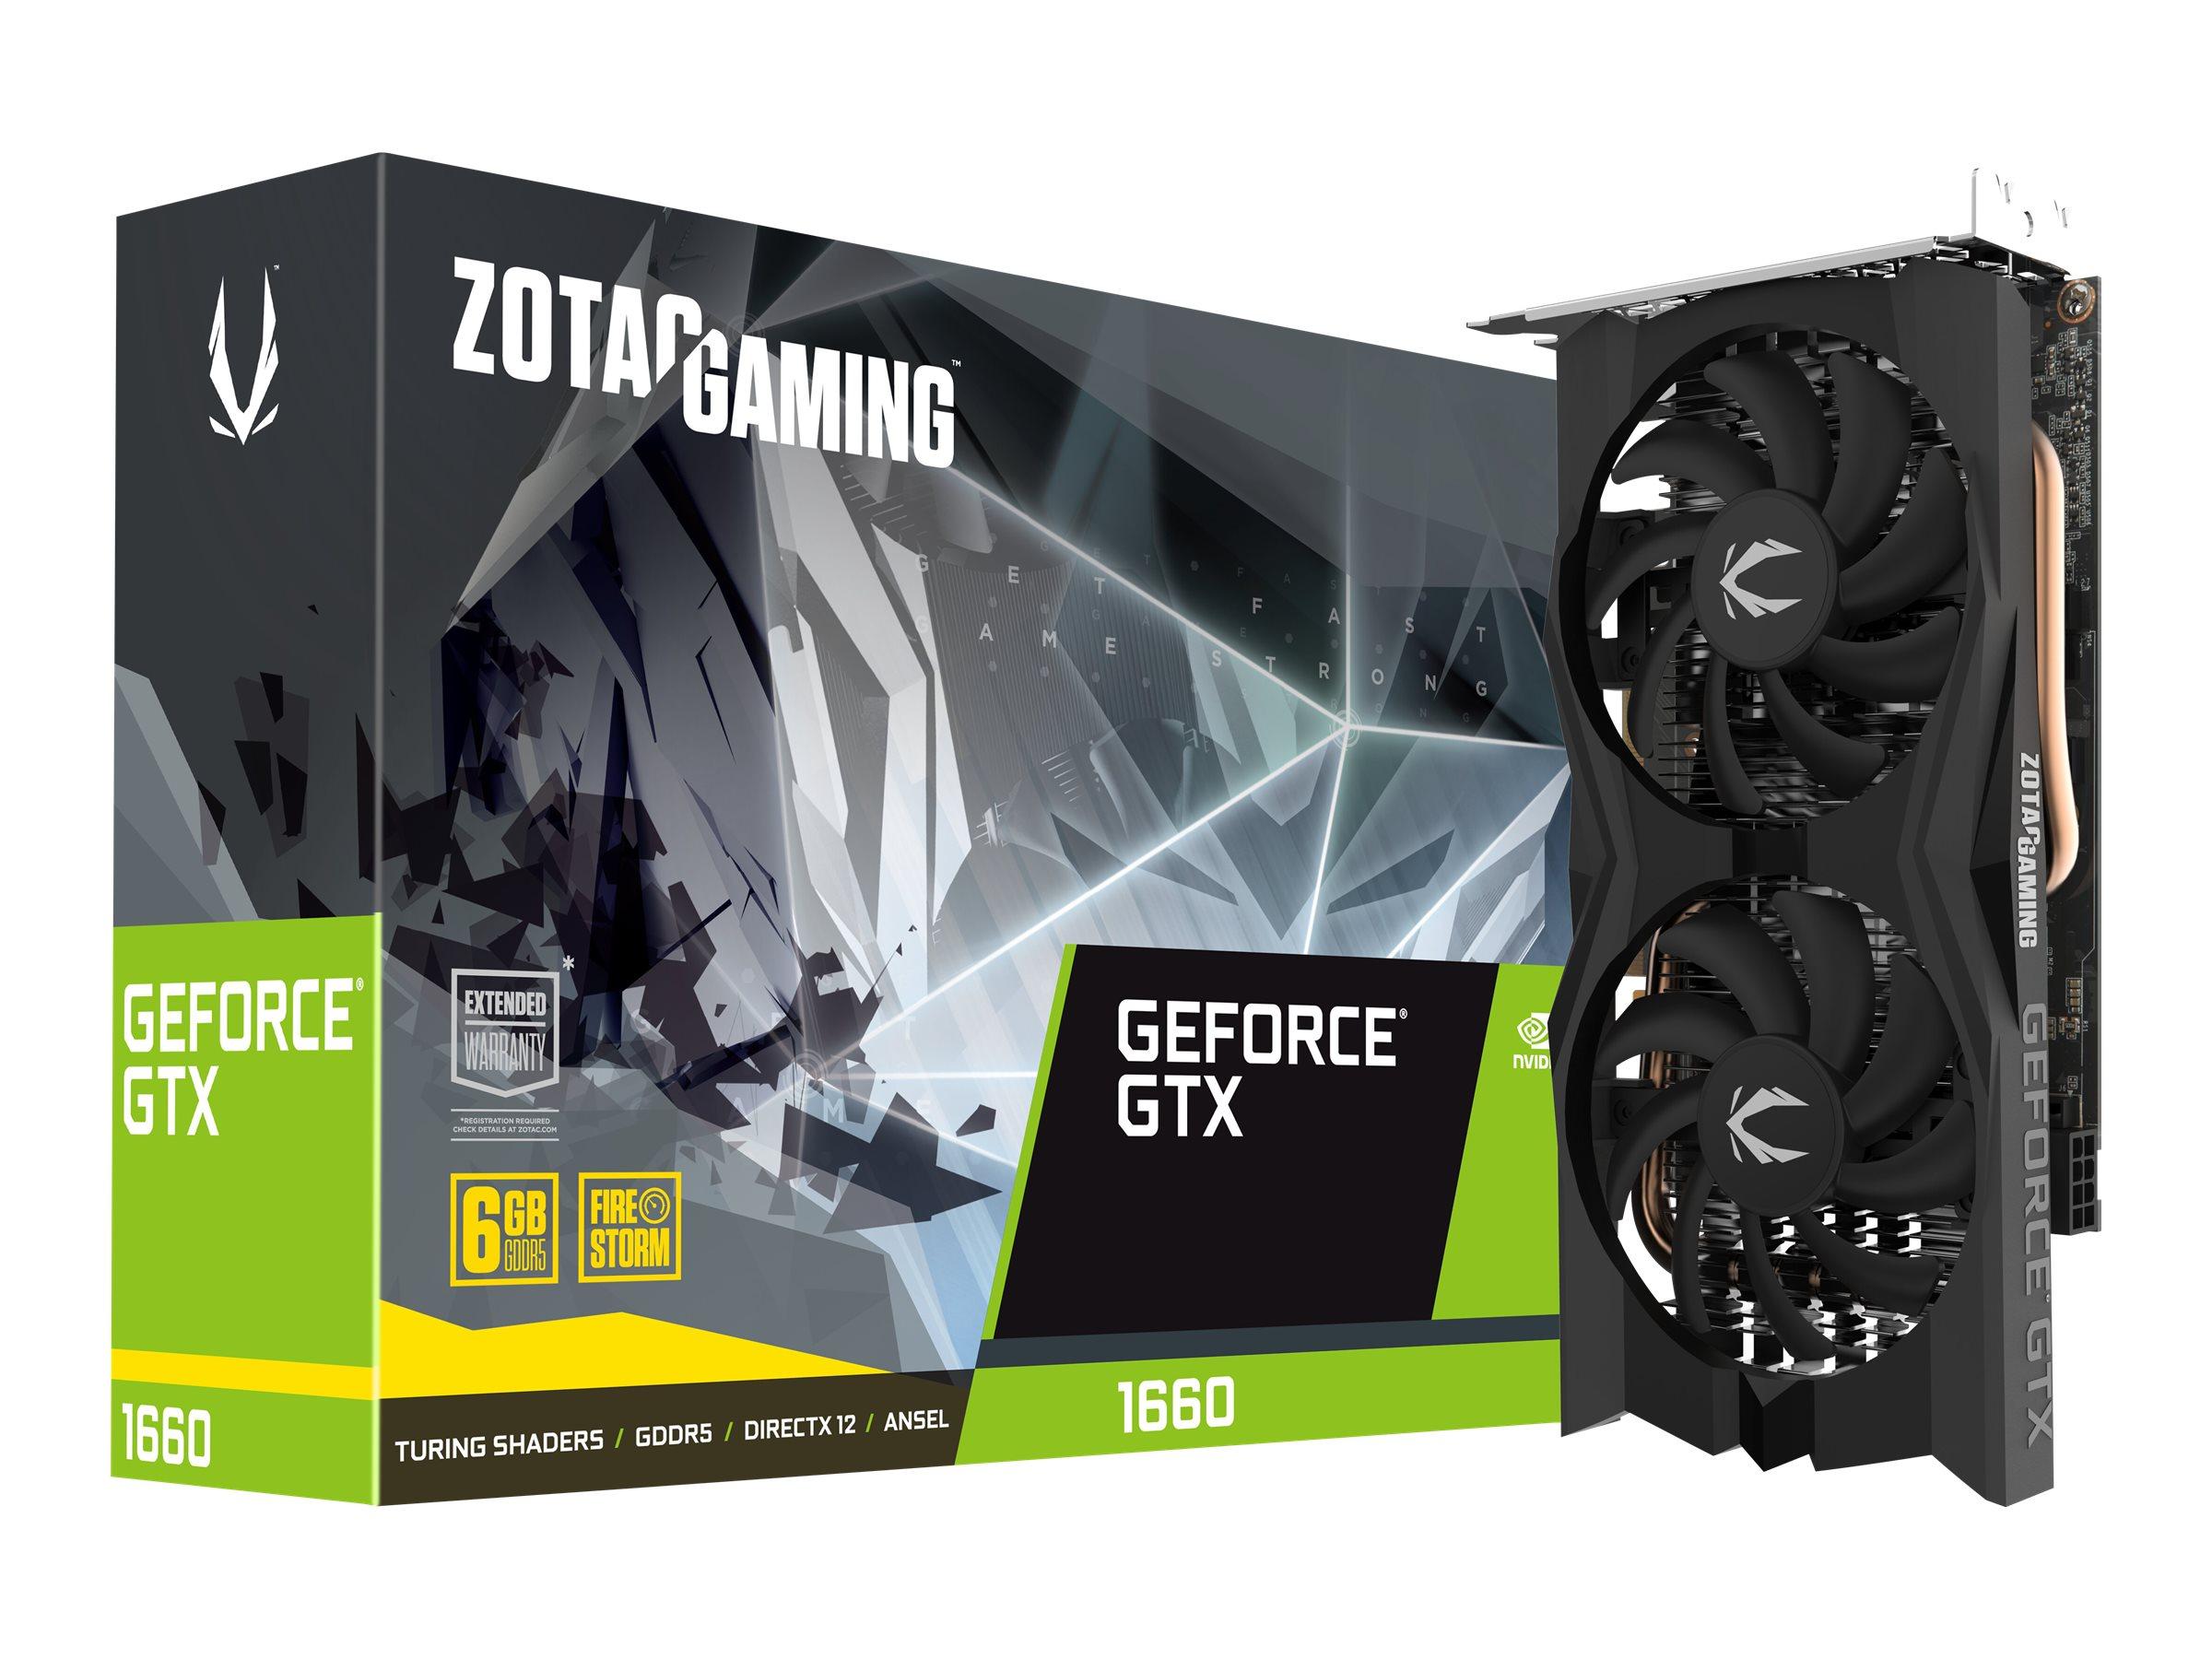 ZOTAC GAMING GeForce GTX 1660 Twin Fan - Grafikkarten